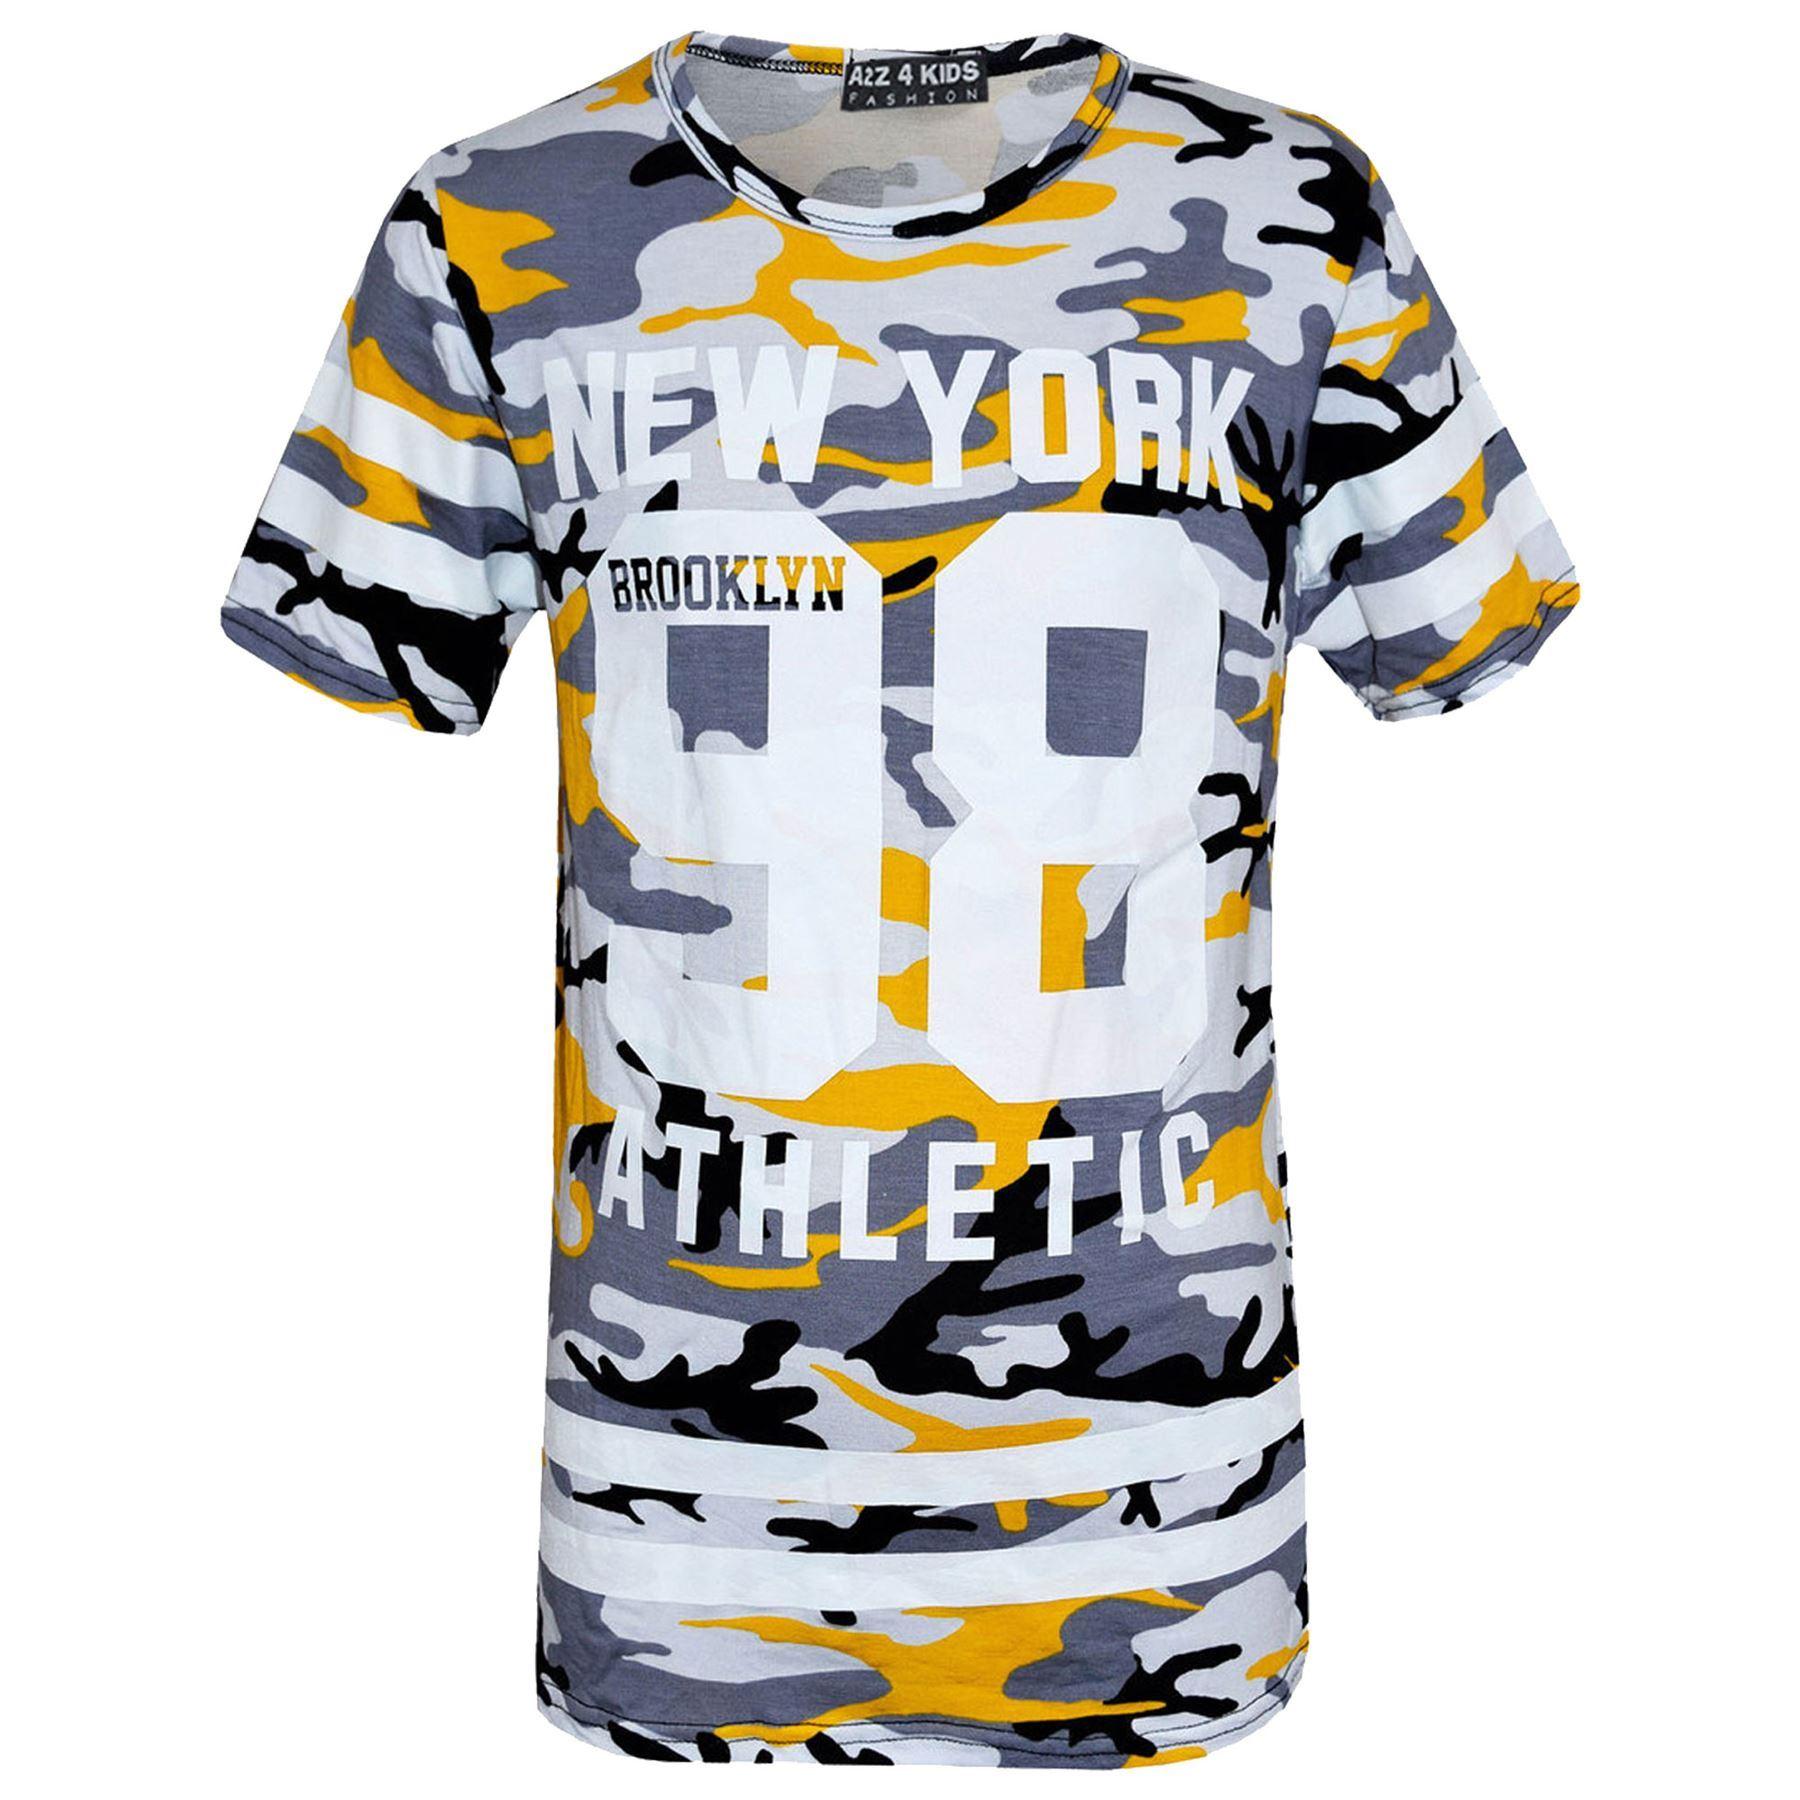 Girls-NEW-YORK-BROOKLYN-98-ATHLECTIC-Camouflage-Print-Top-amp-Legging-Set-7-13-Yr thumbnail 93